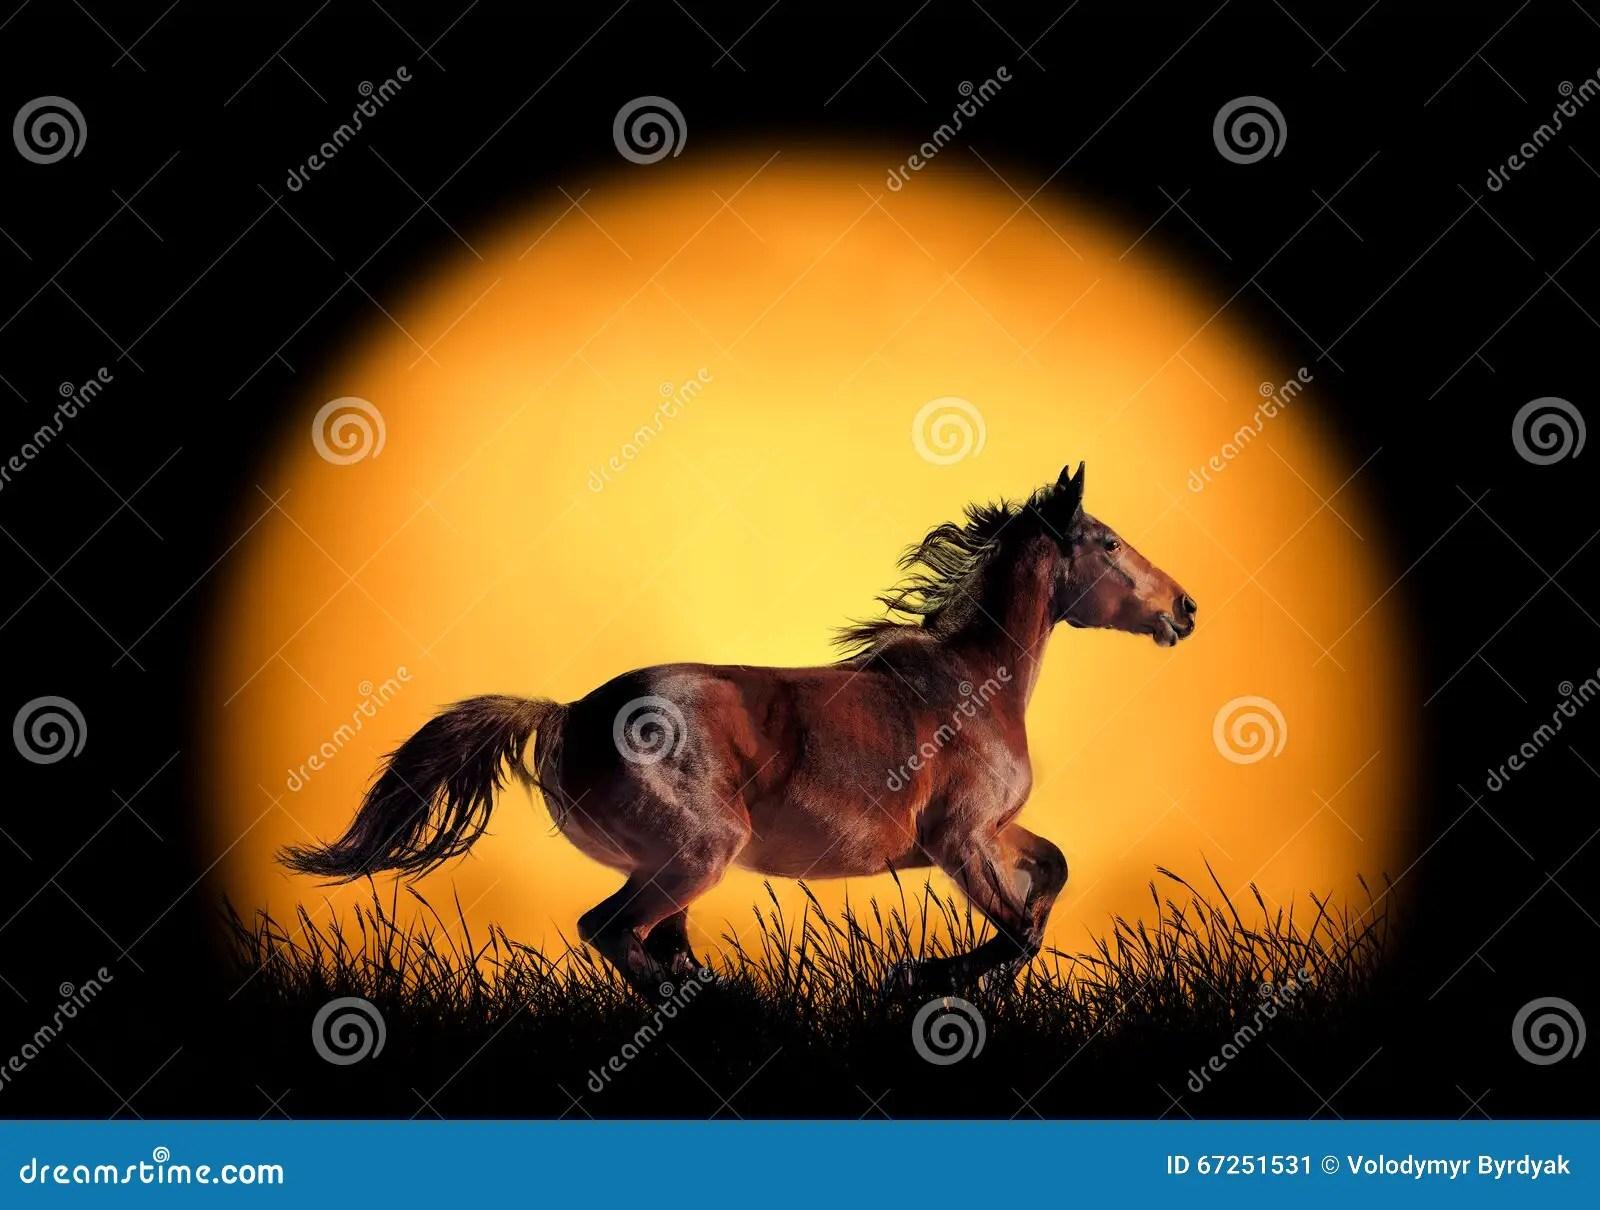 Horse Running On The Background Of Sunset Stock Photo